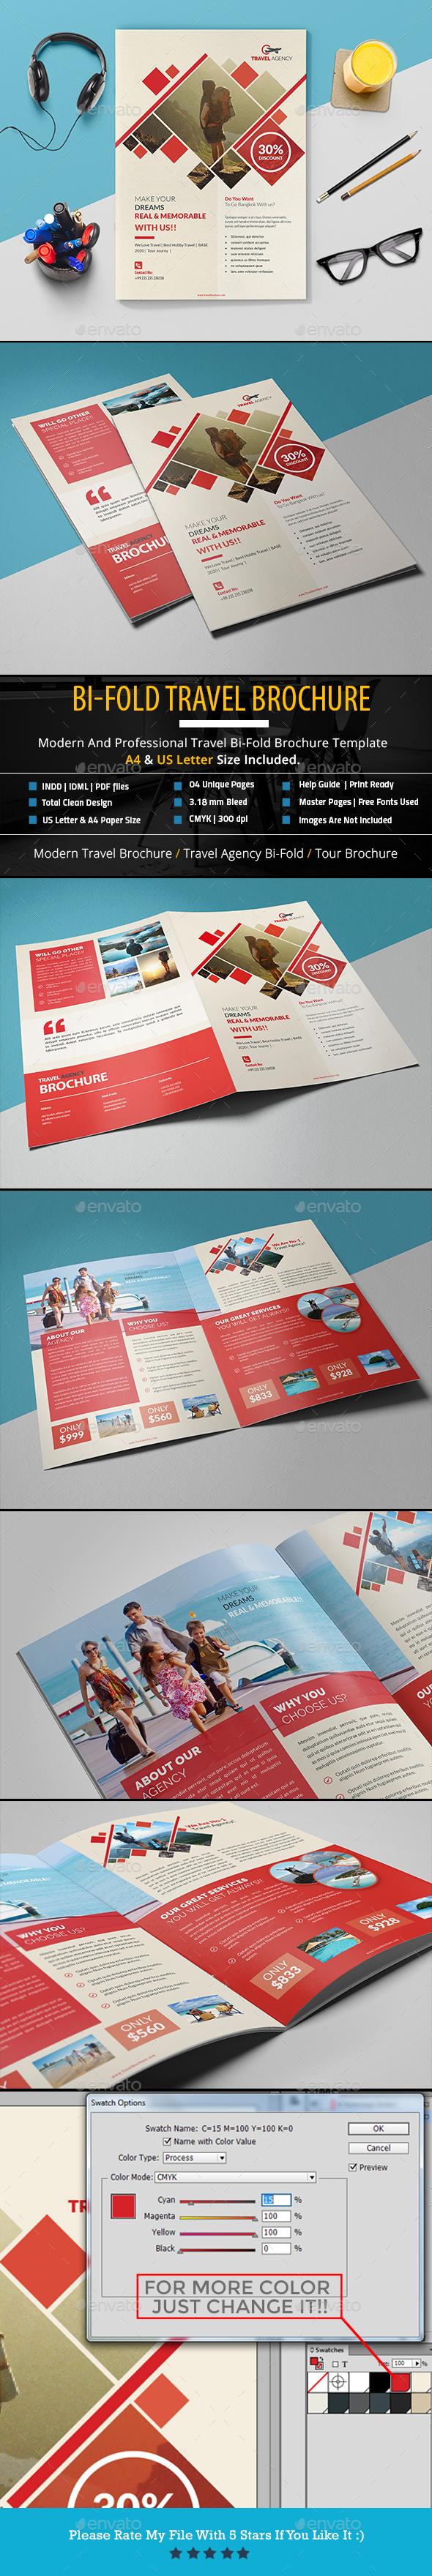 Bi-Fold Travel Brochure - Brochures Print Templates